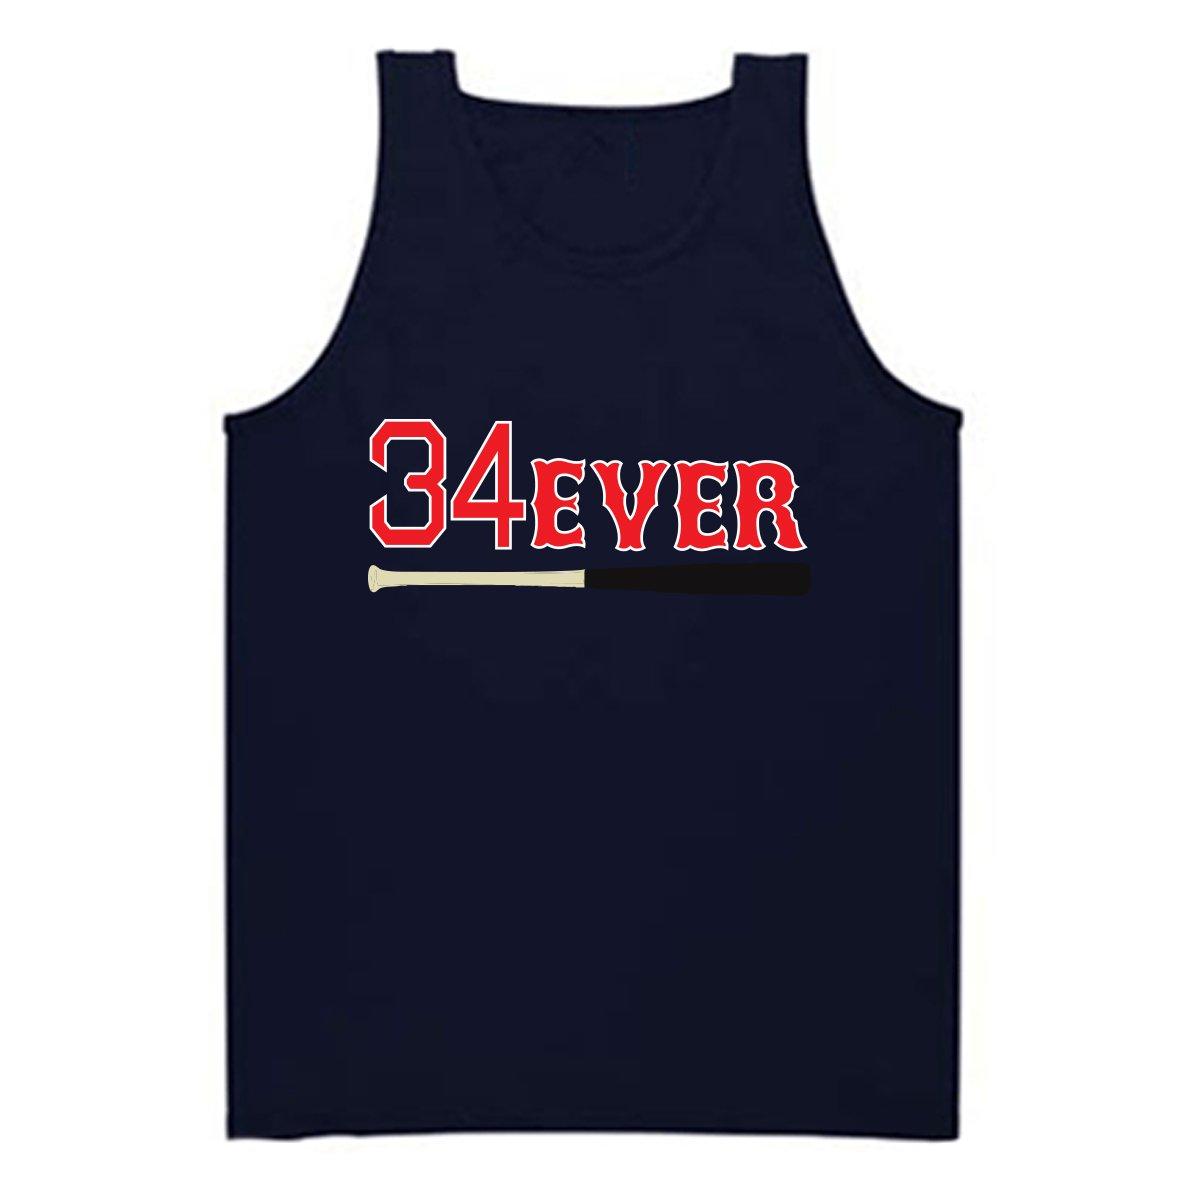 Navy Ortiz Boston 34 Ever Tank Top Shirts